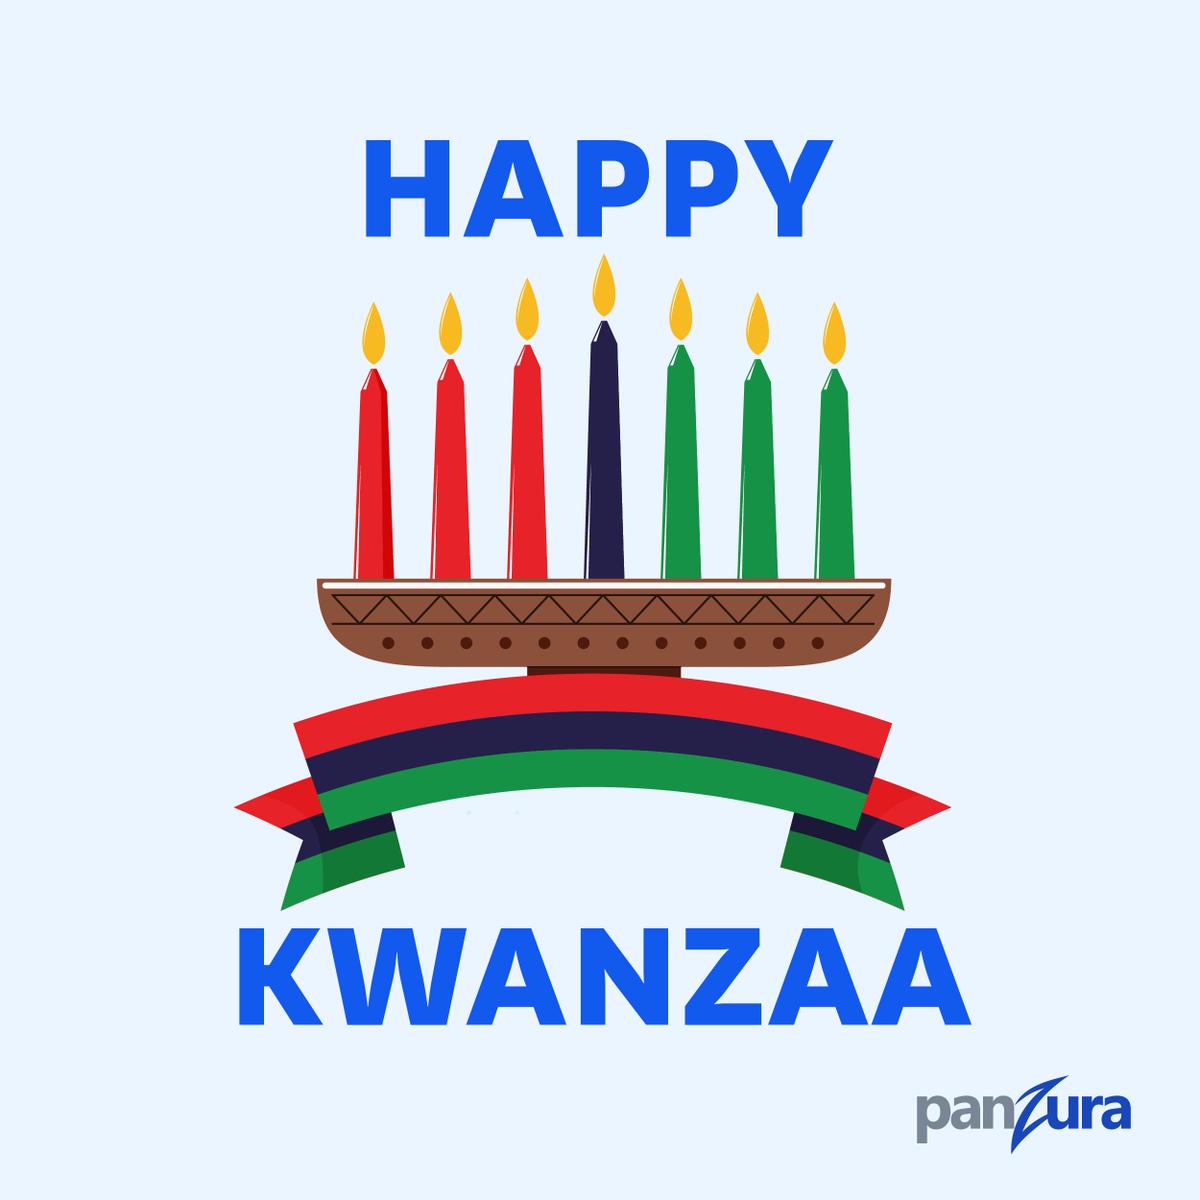 Happy Kwanzaa to all! https://t.co/YBccbmALOf